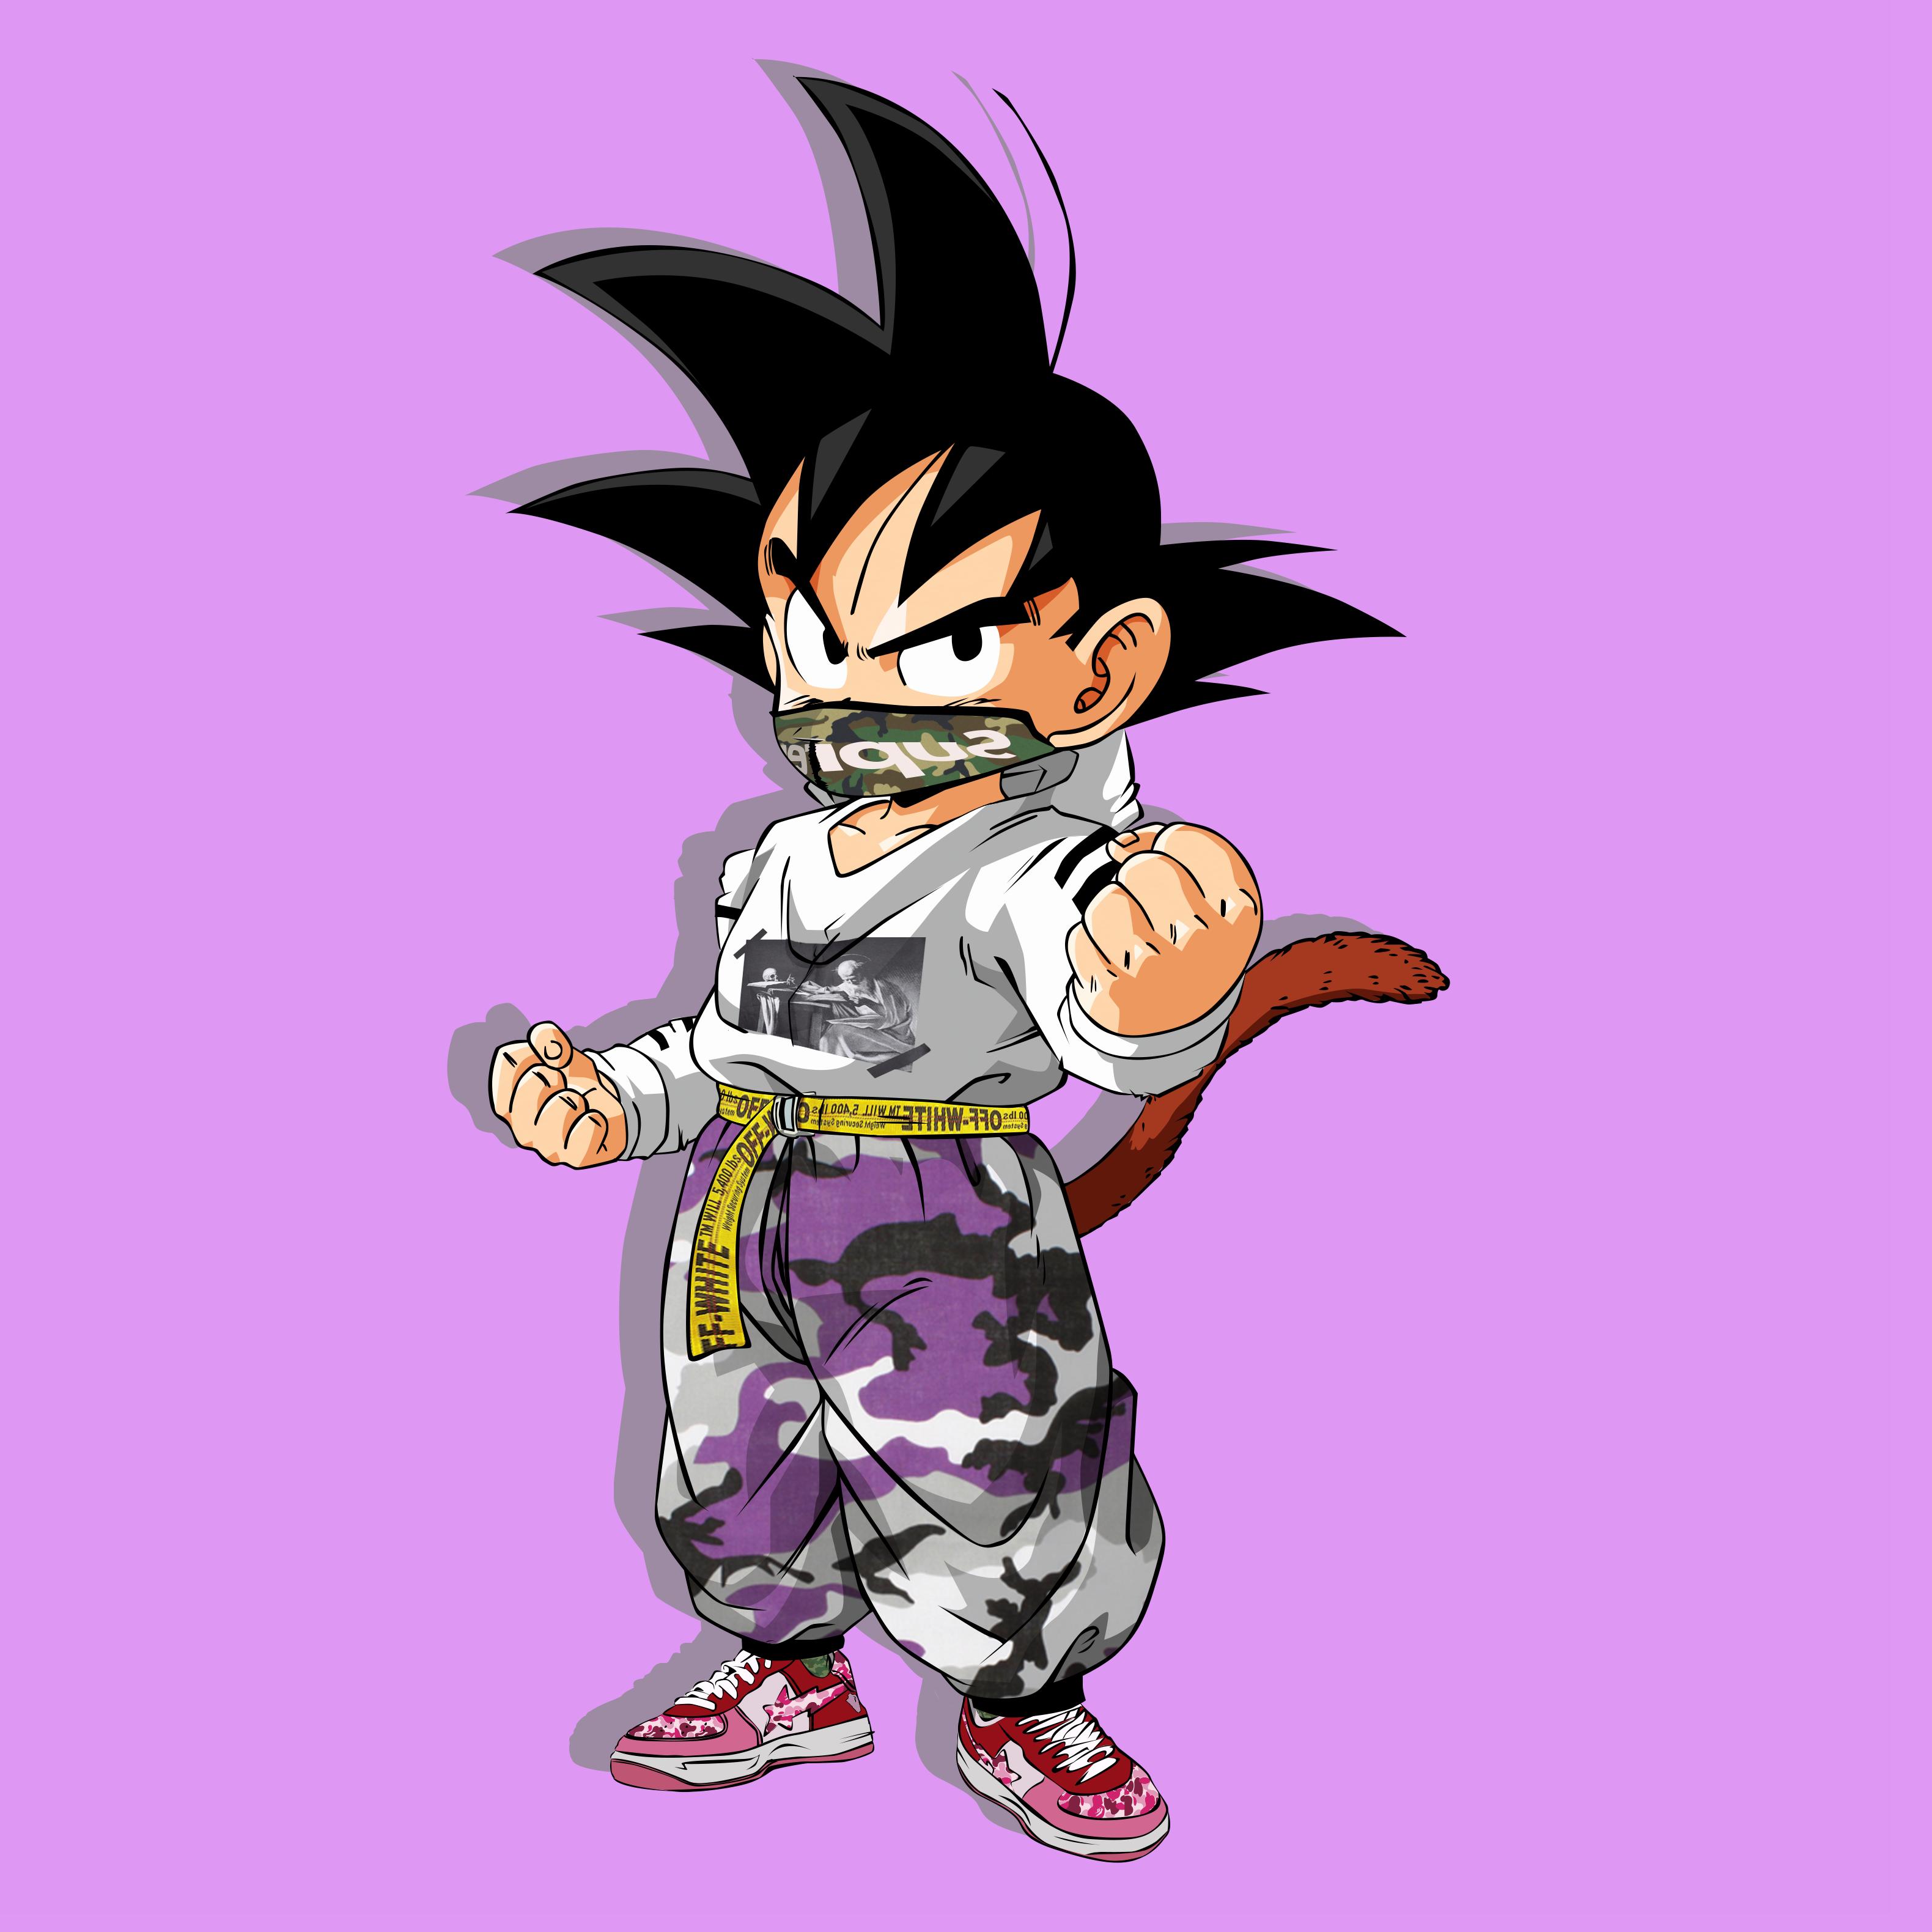 60fb139f HYPEBEAST GOKU | Off-White Bape Supreme | scoper gang | Goku, Dragon ...